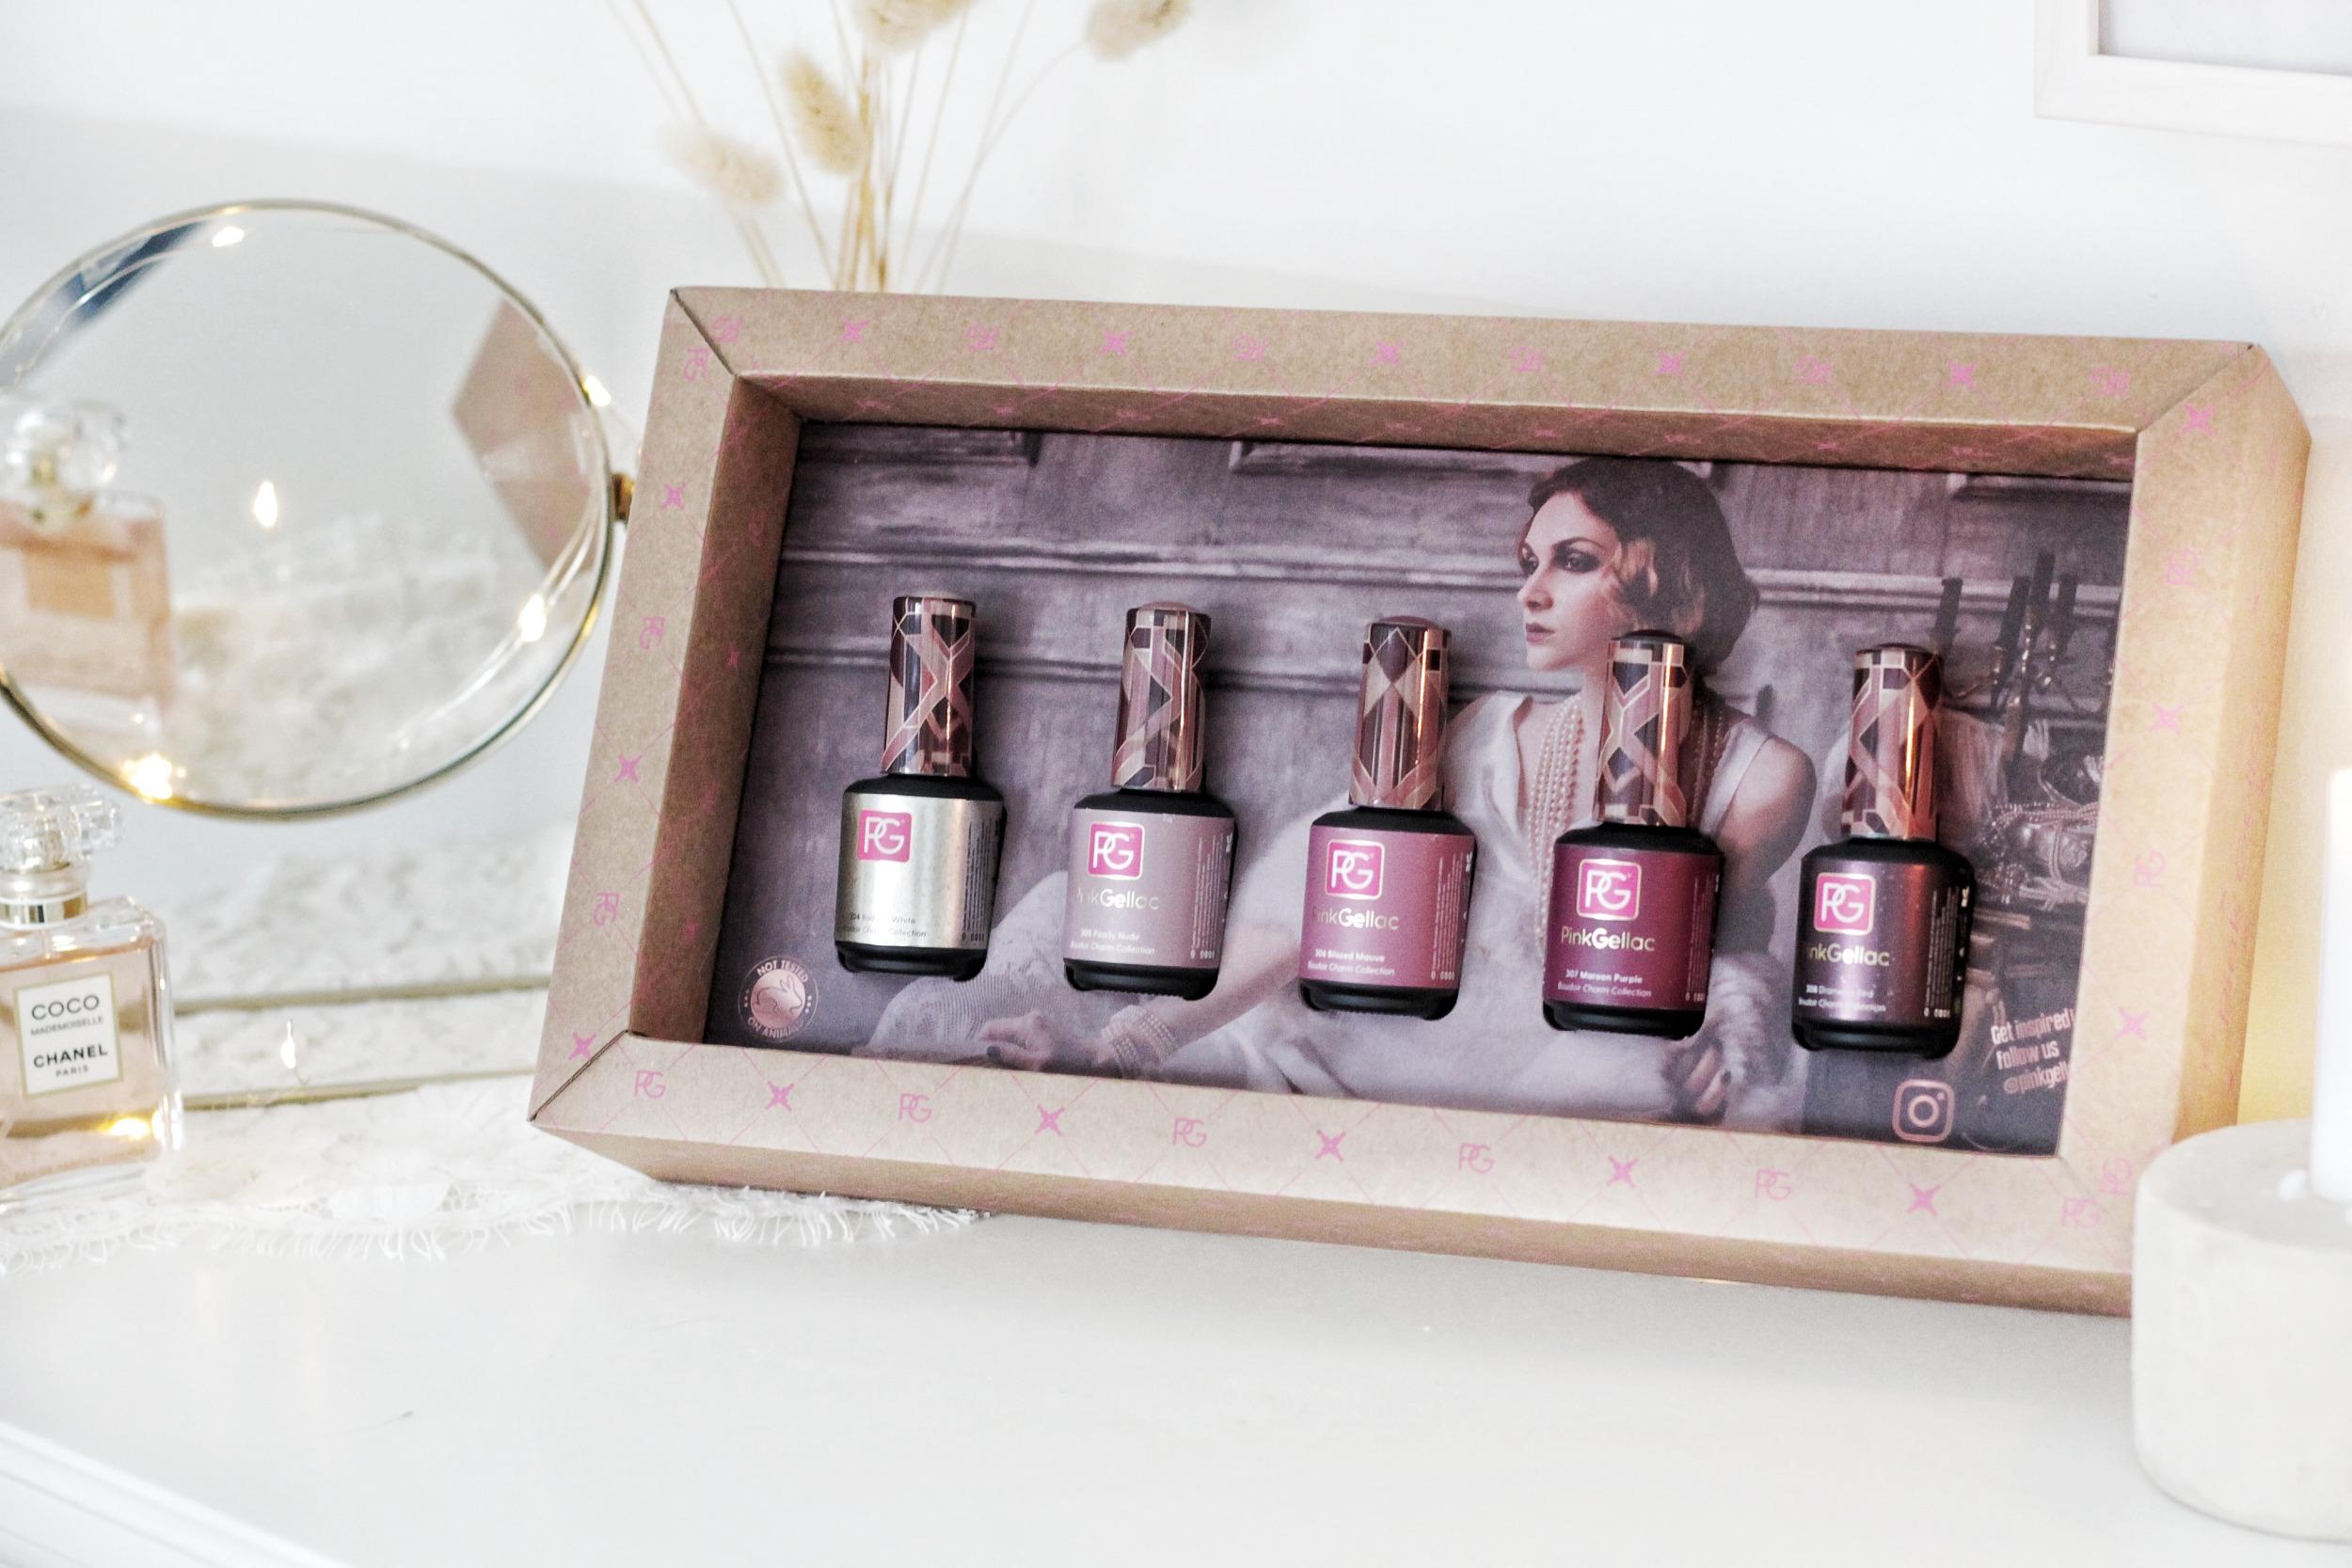 boudoir Charm Collectie inhoud box